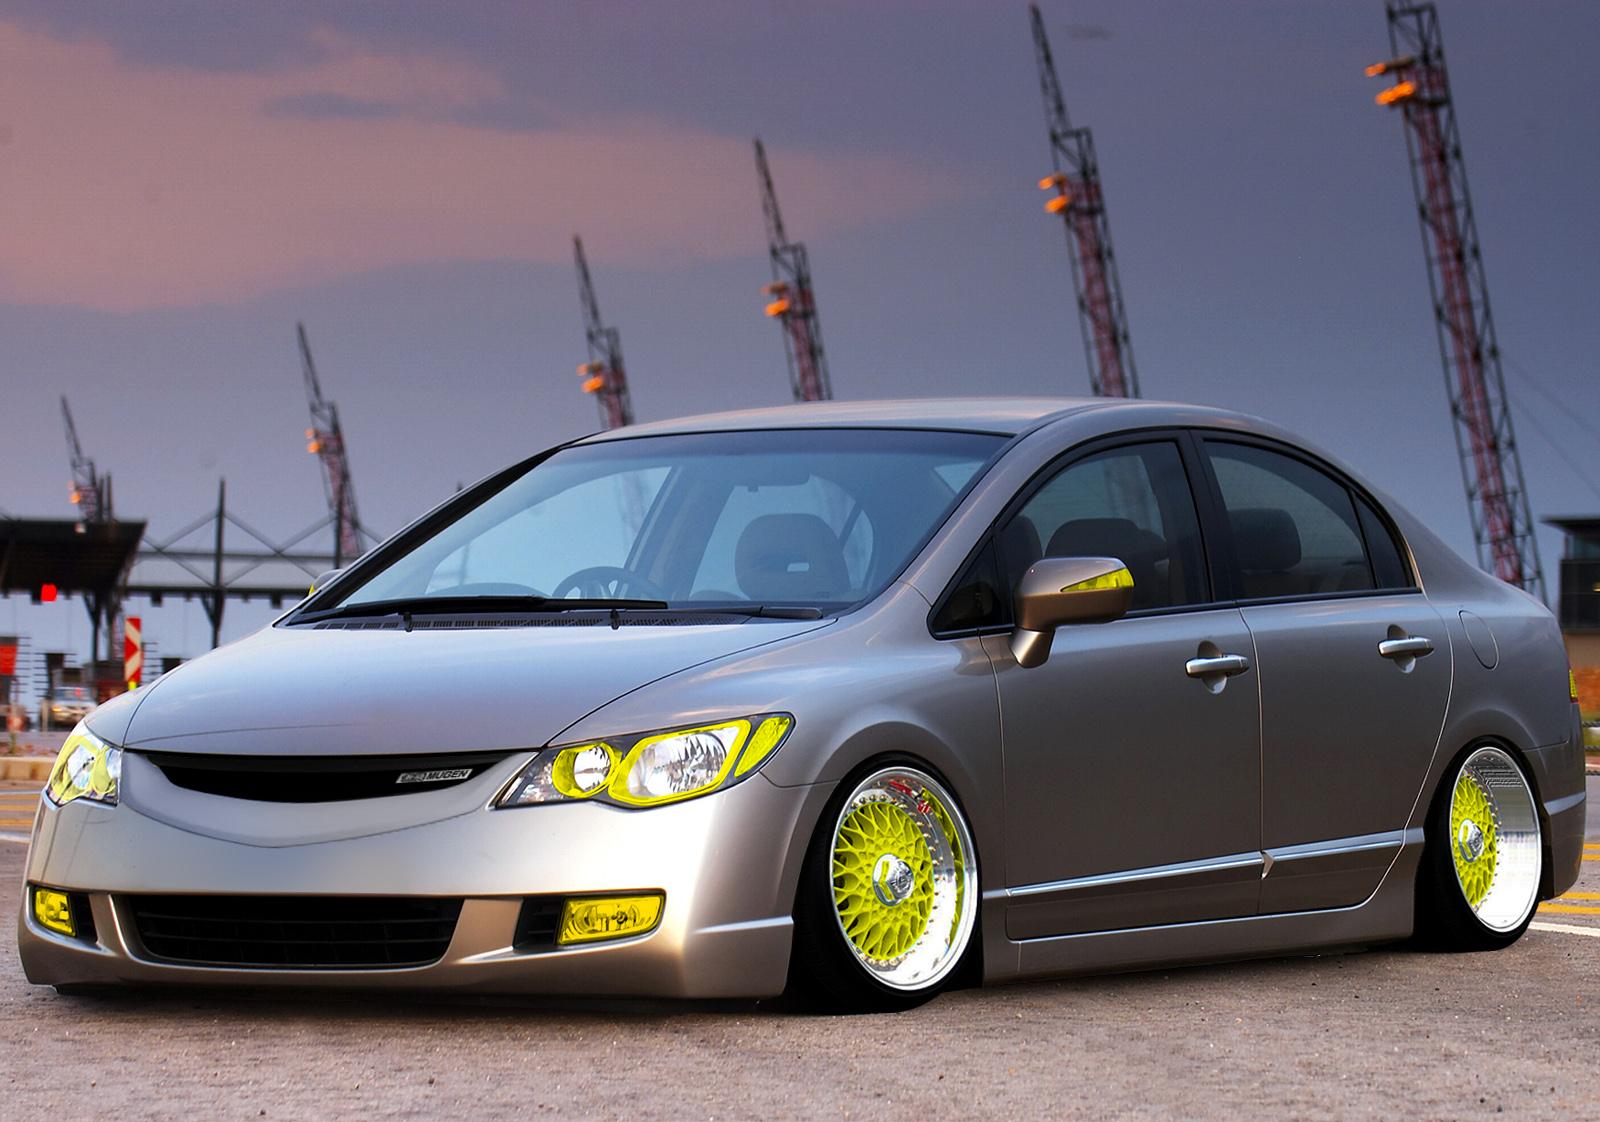 Honda Civic Forum >> Honda civic FD by Haniiiiii on DeviantArt